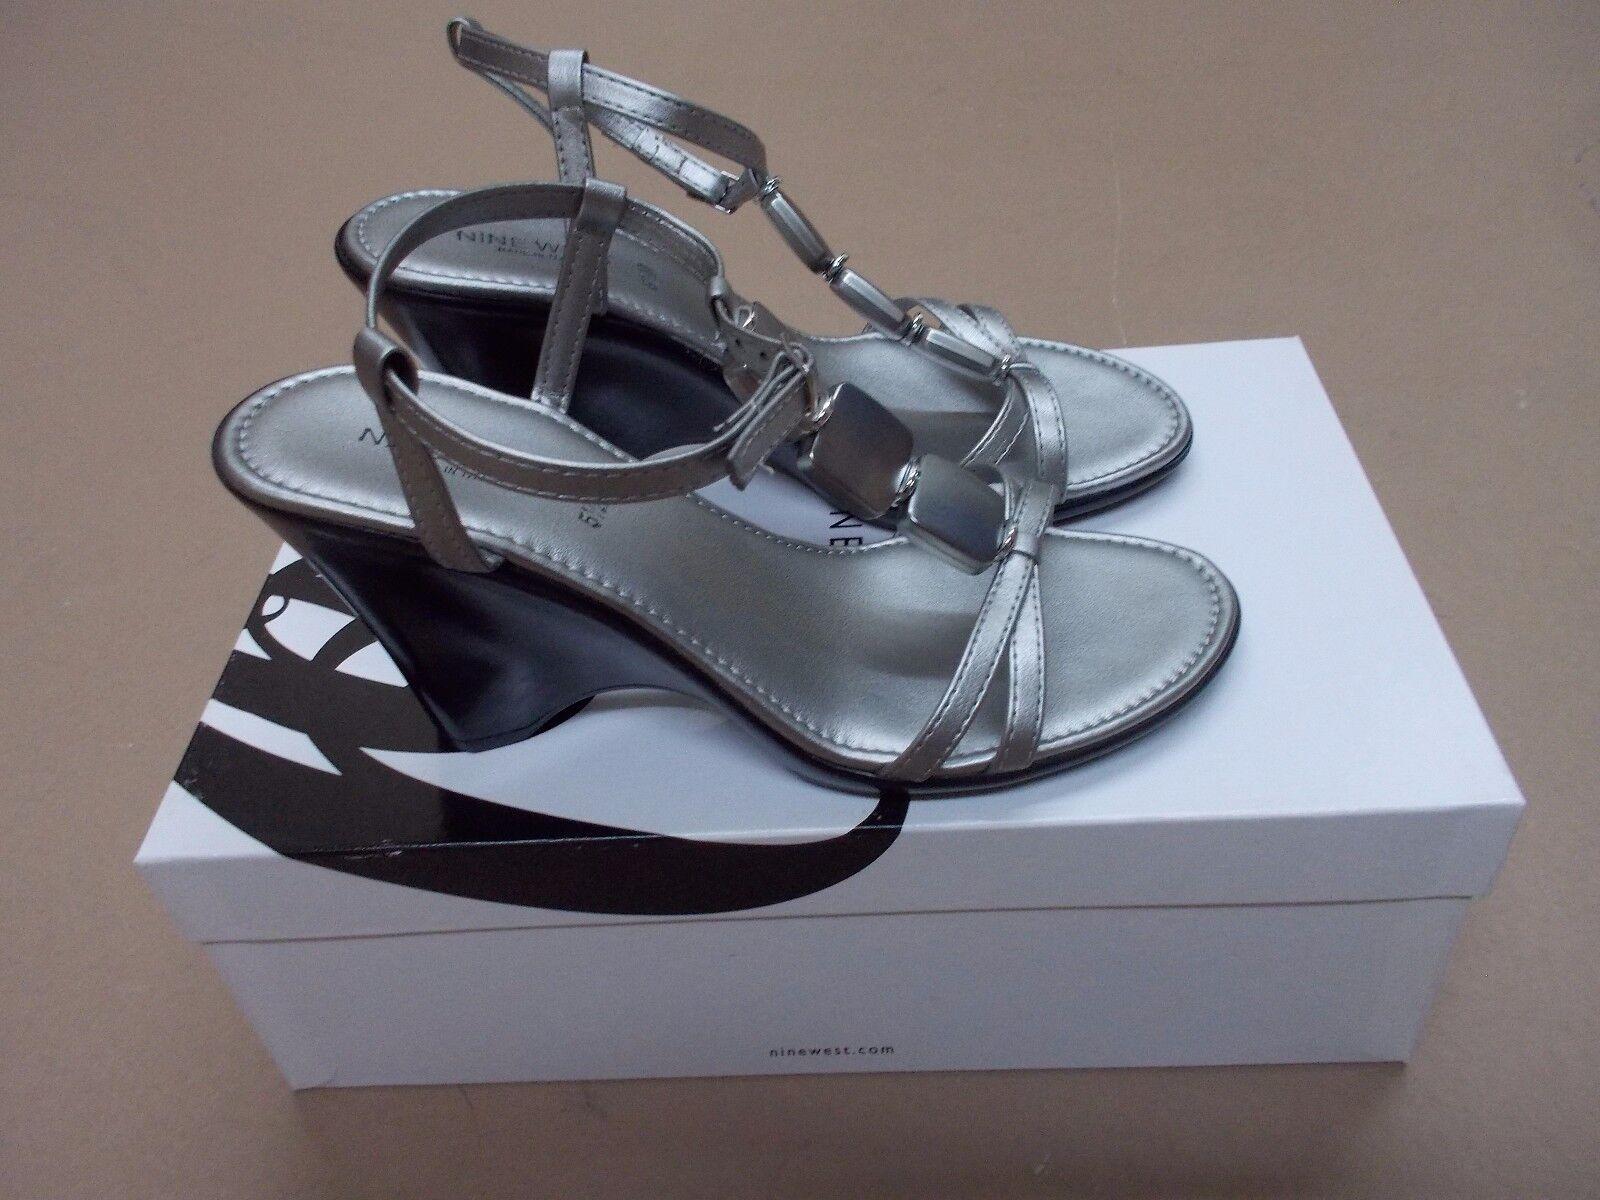 NEW Nine West St. Croix womens tstrap ankle strap sandals heels silver size 5.5